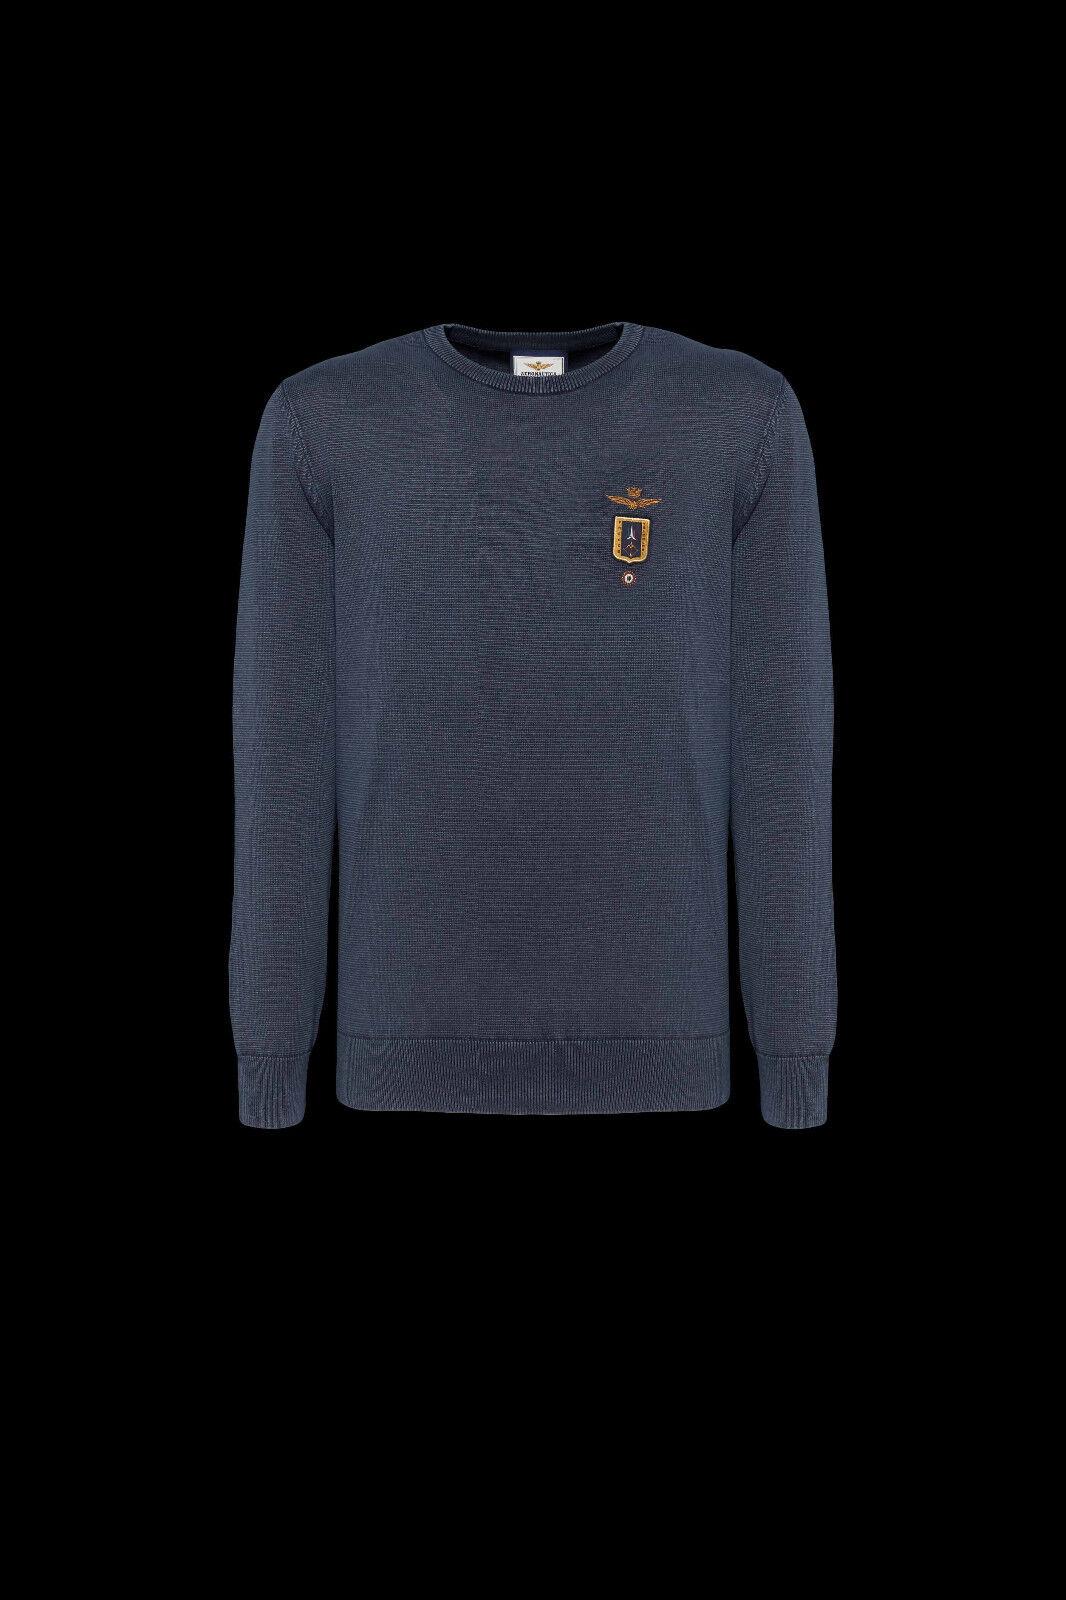 T-shirt  Herren Aeronautica Militare MA1136 2018/2019 Maglia Cotone nera Blu NUOVA